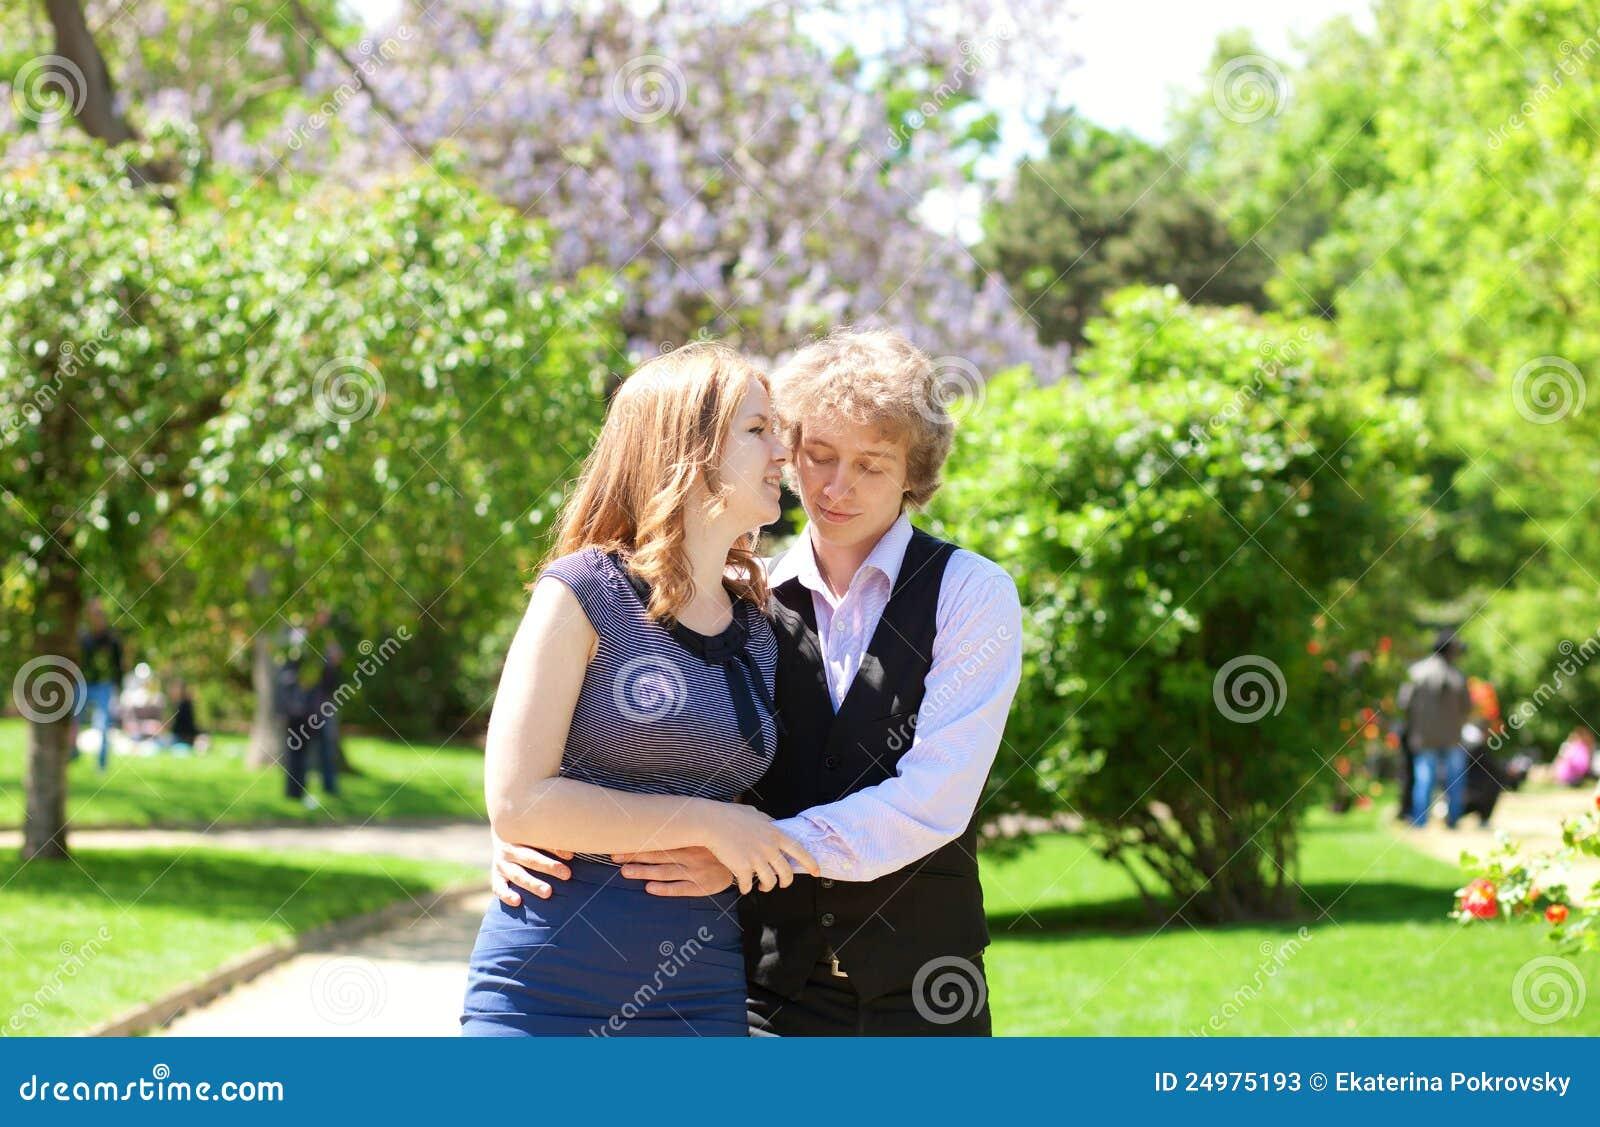 dating sites in portland oregon